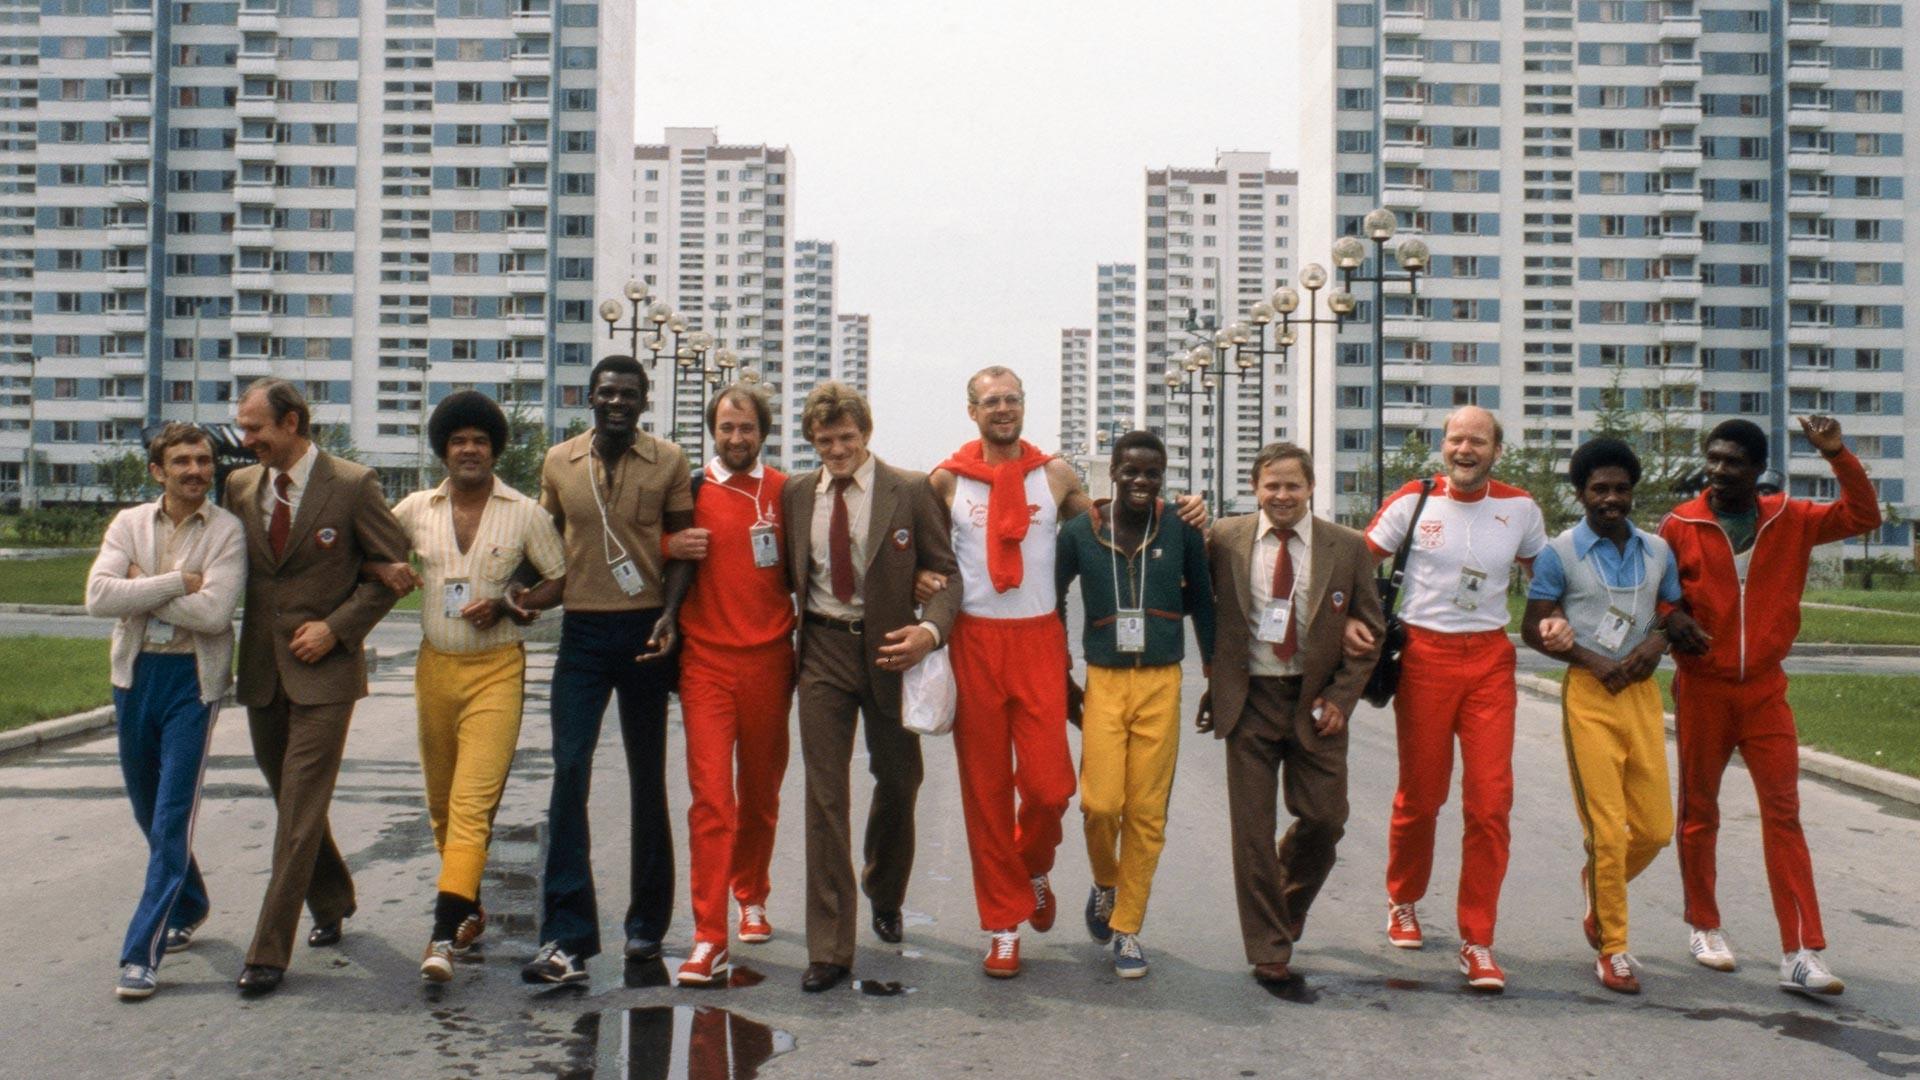 Atlet-atlet Uni Soviet, Denmark, dan Guyana di Kompleks Olimpiade.